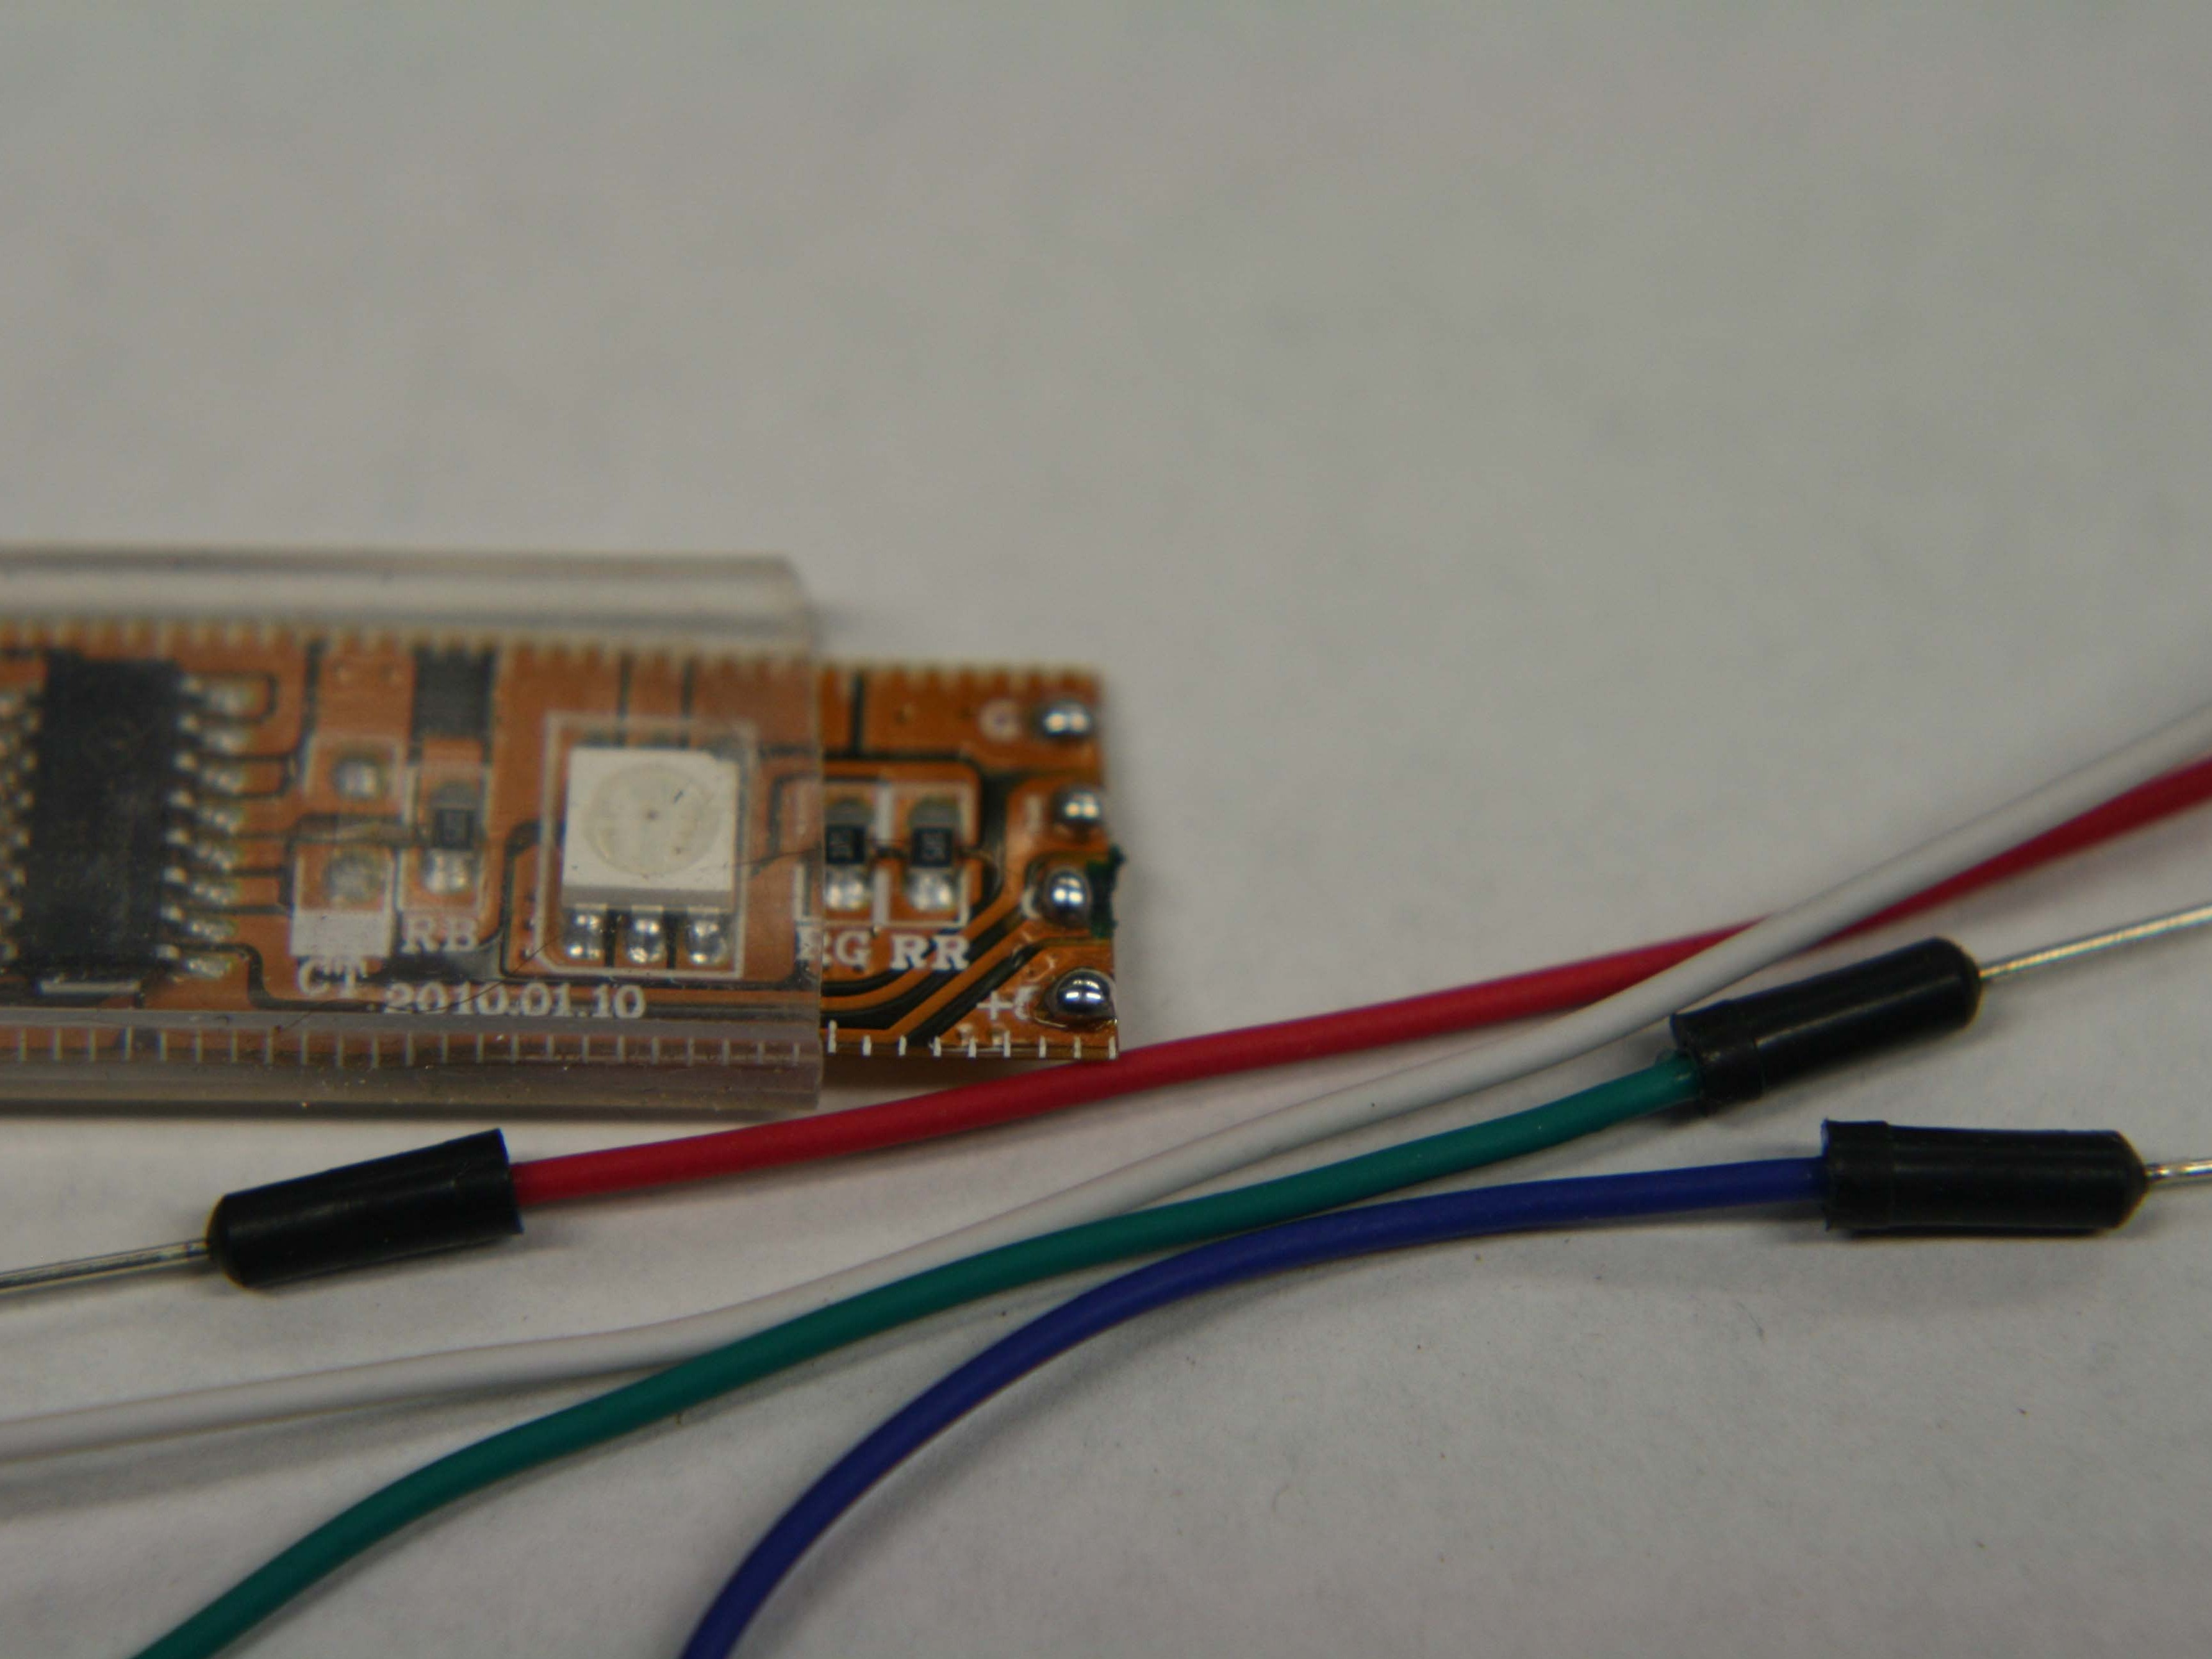 Solder a Digitally Addressable RGB LEDStrip